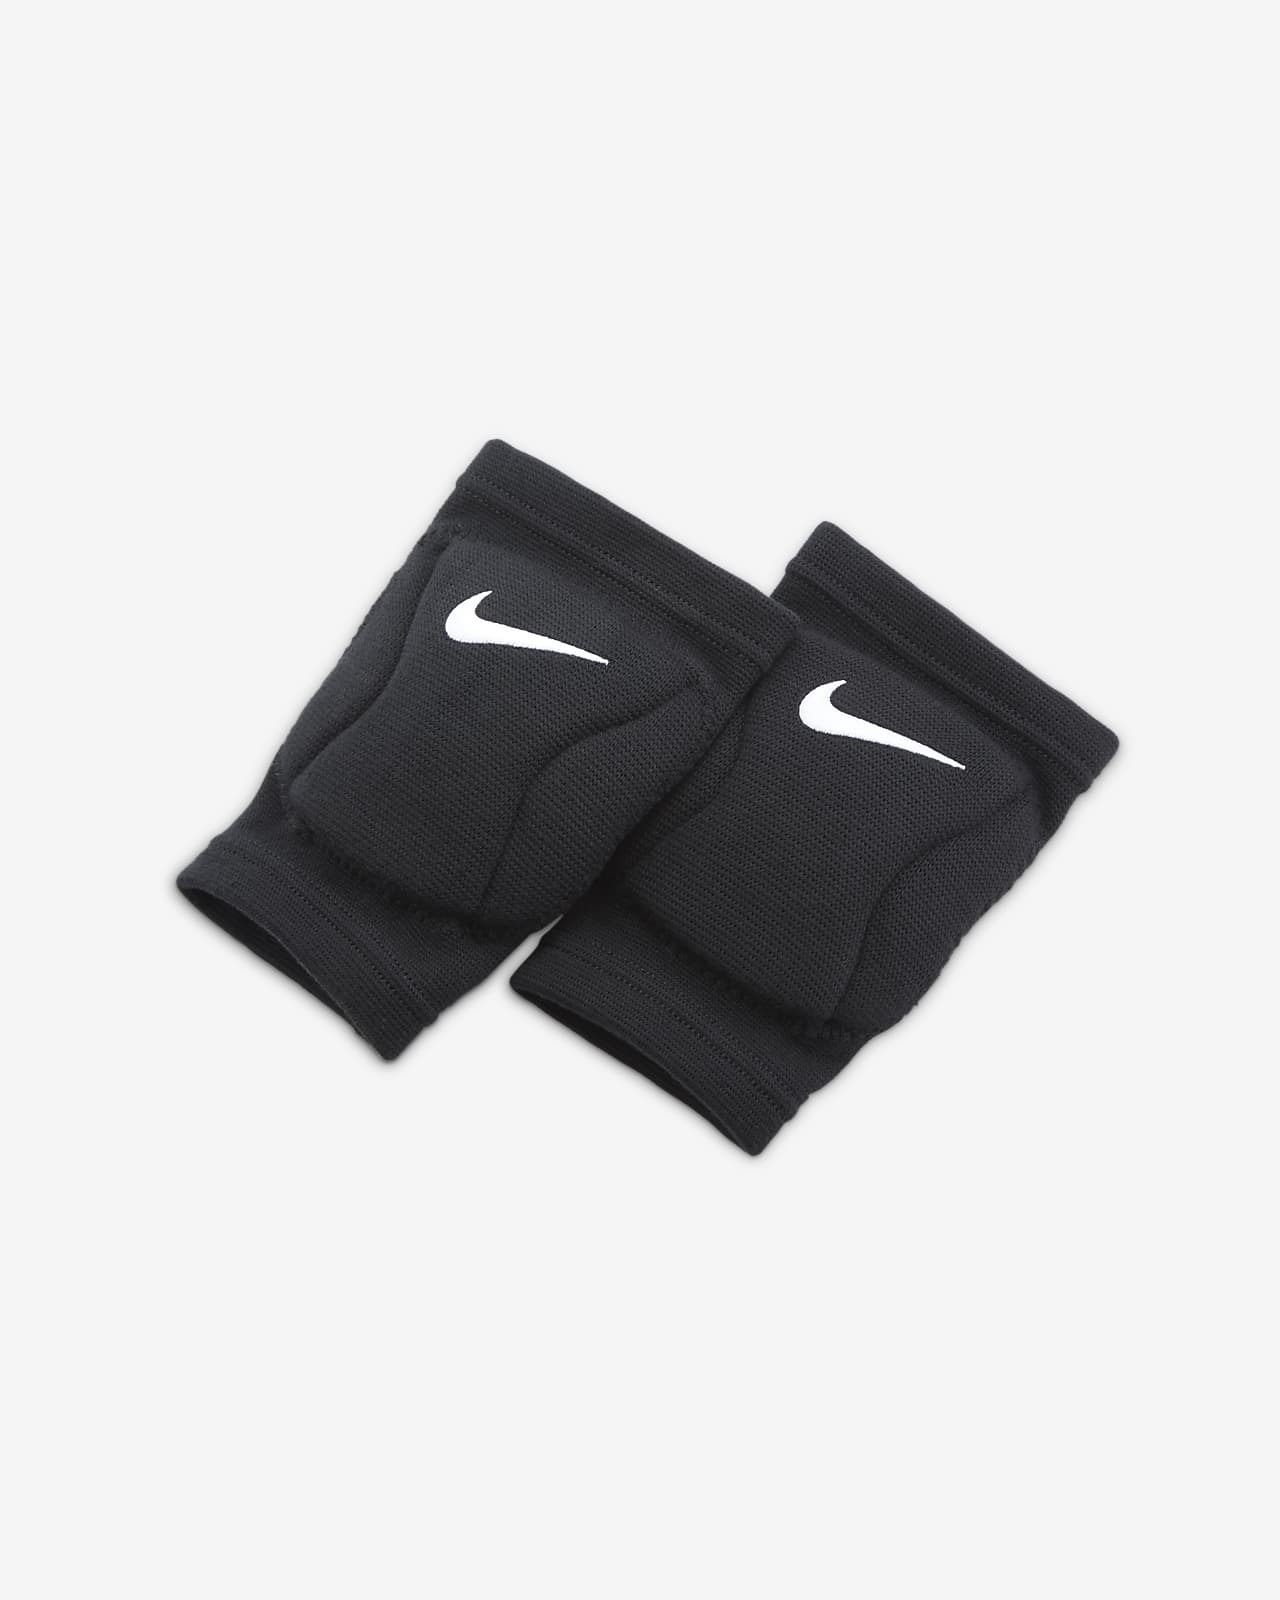 Nike Streak Kids' Volleyball Knee Pads